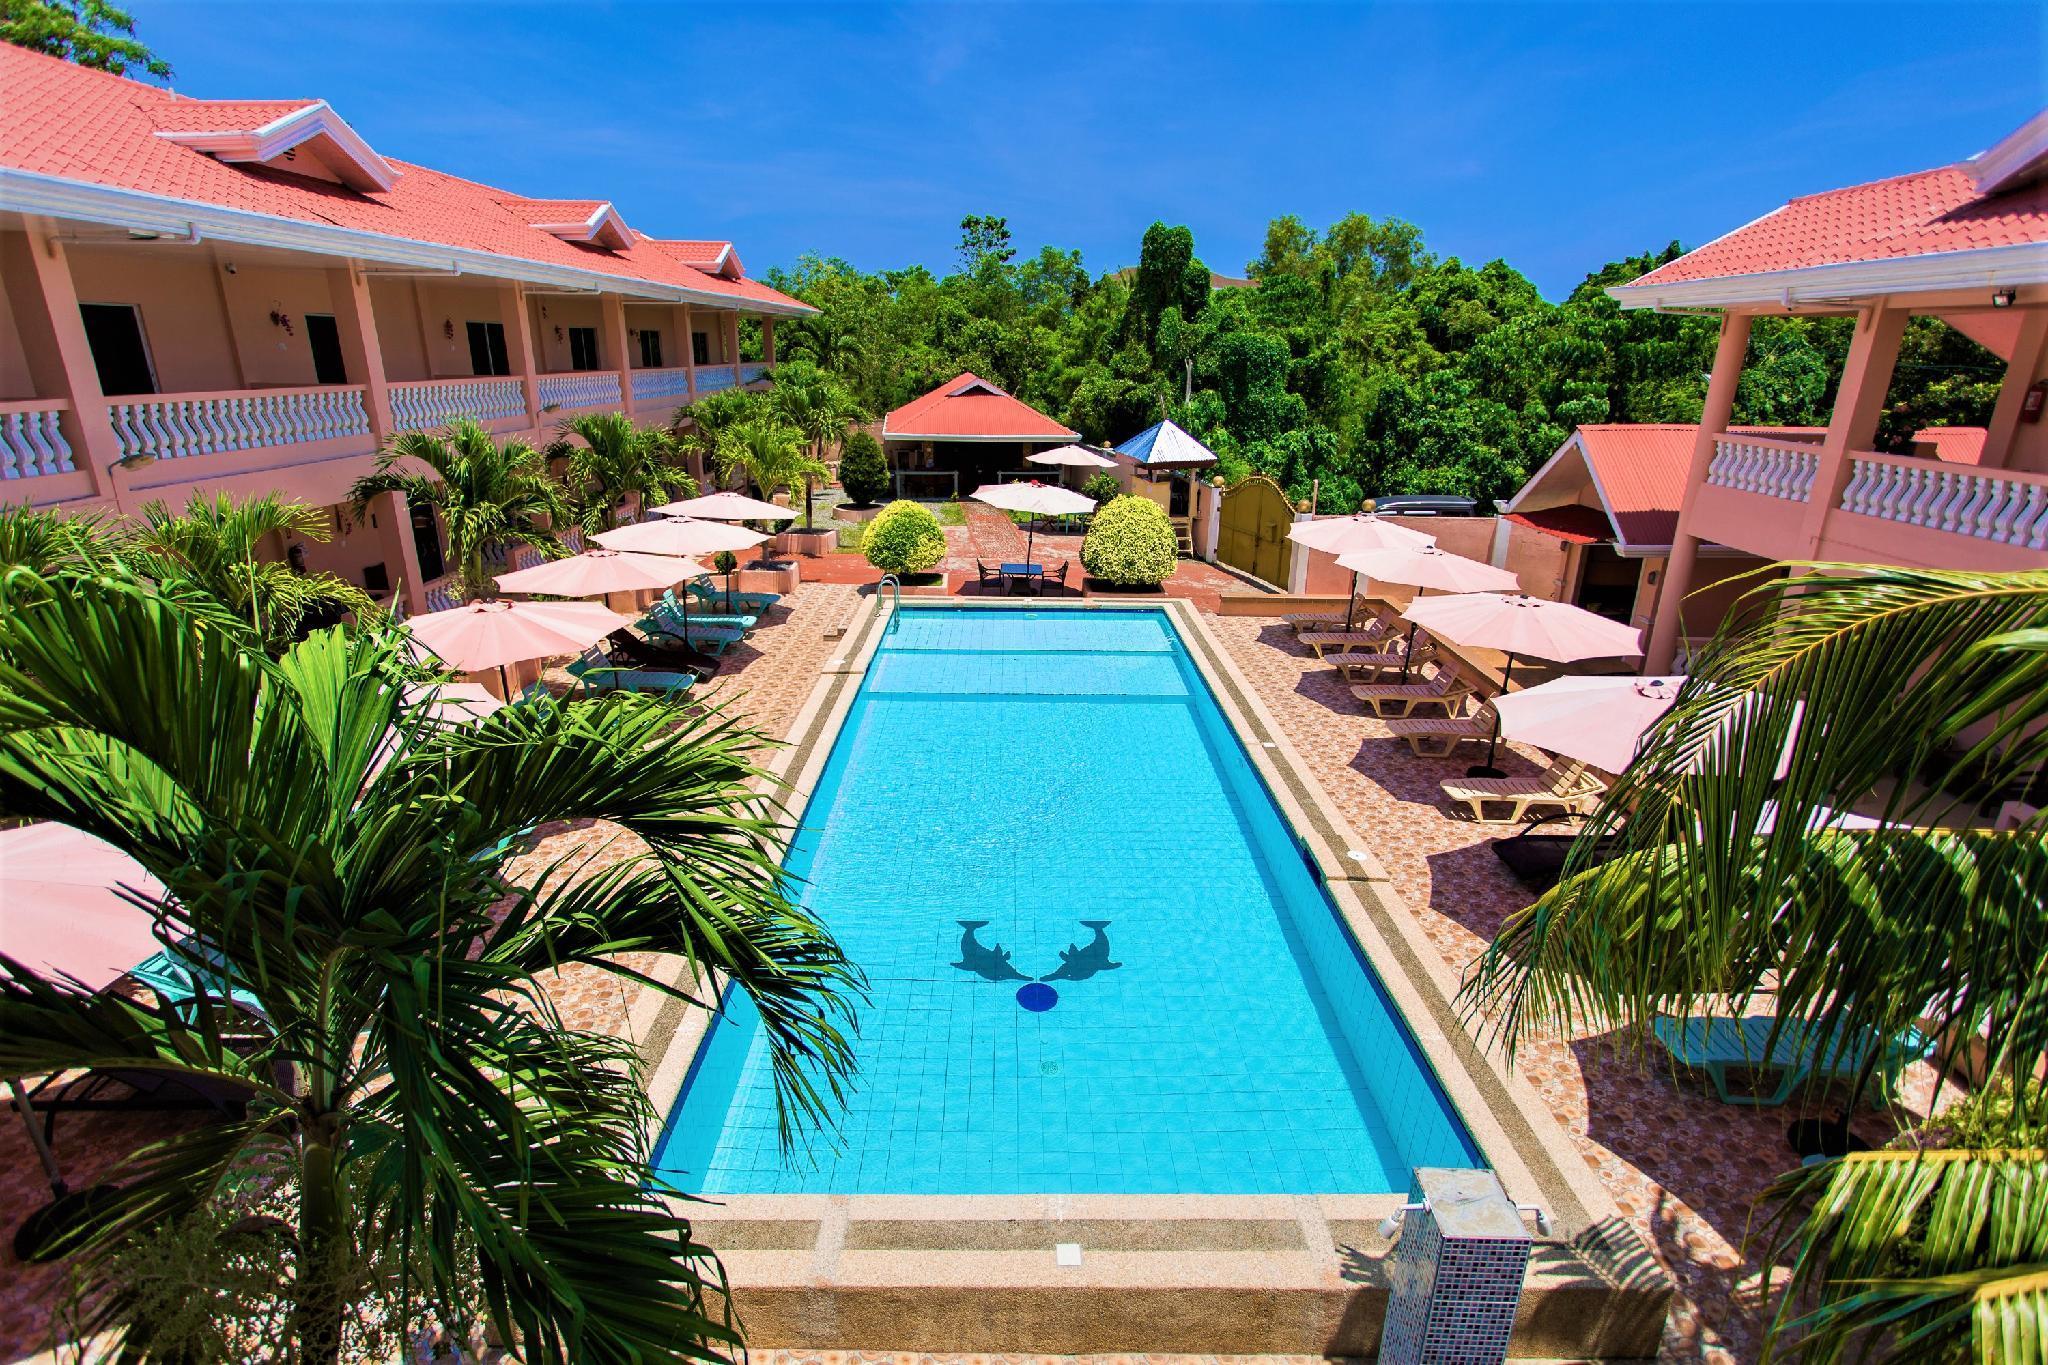 Conrada's Place Hotel And Resort